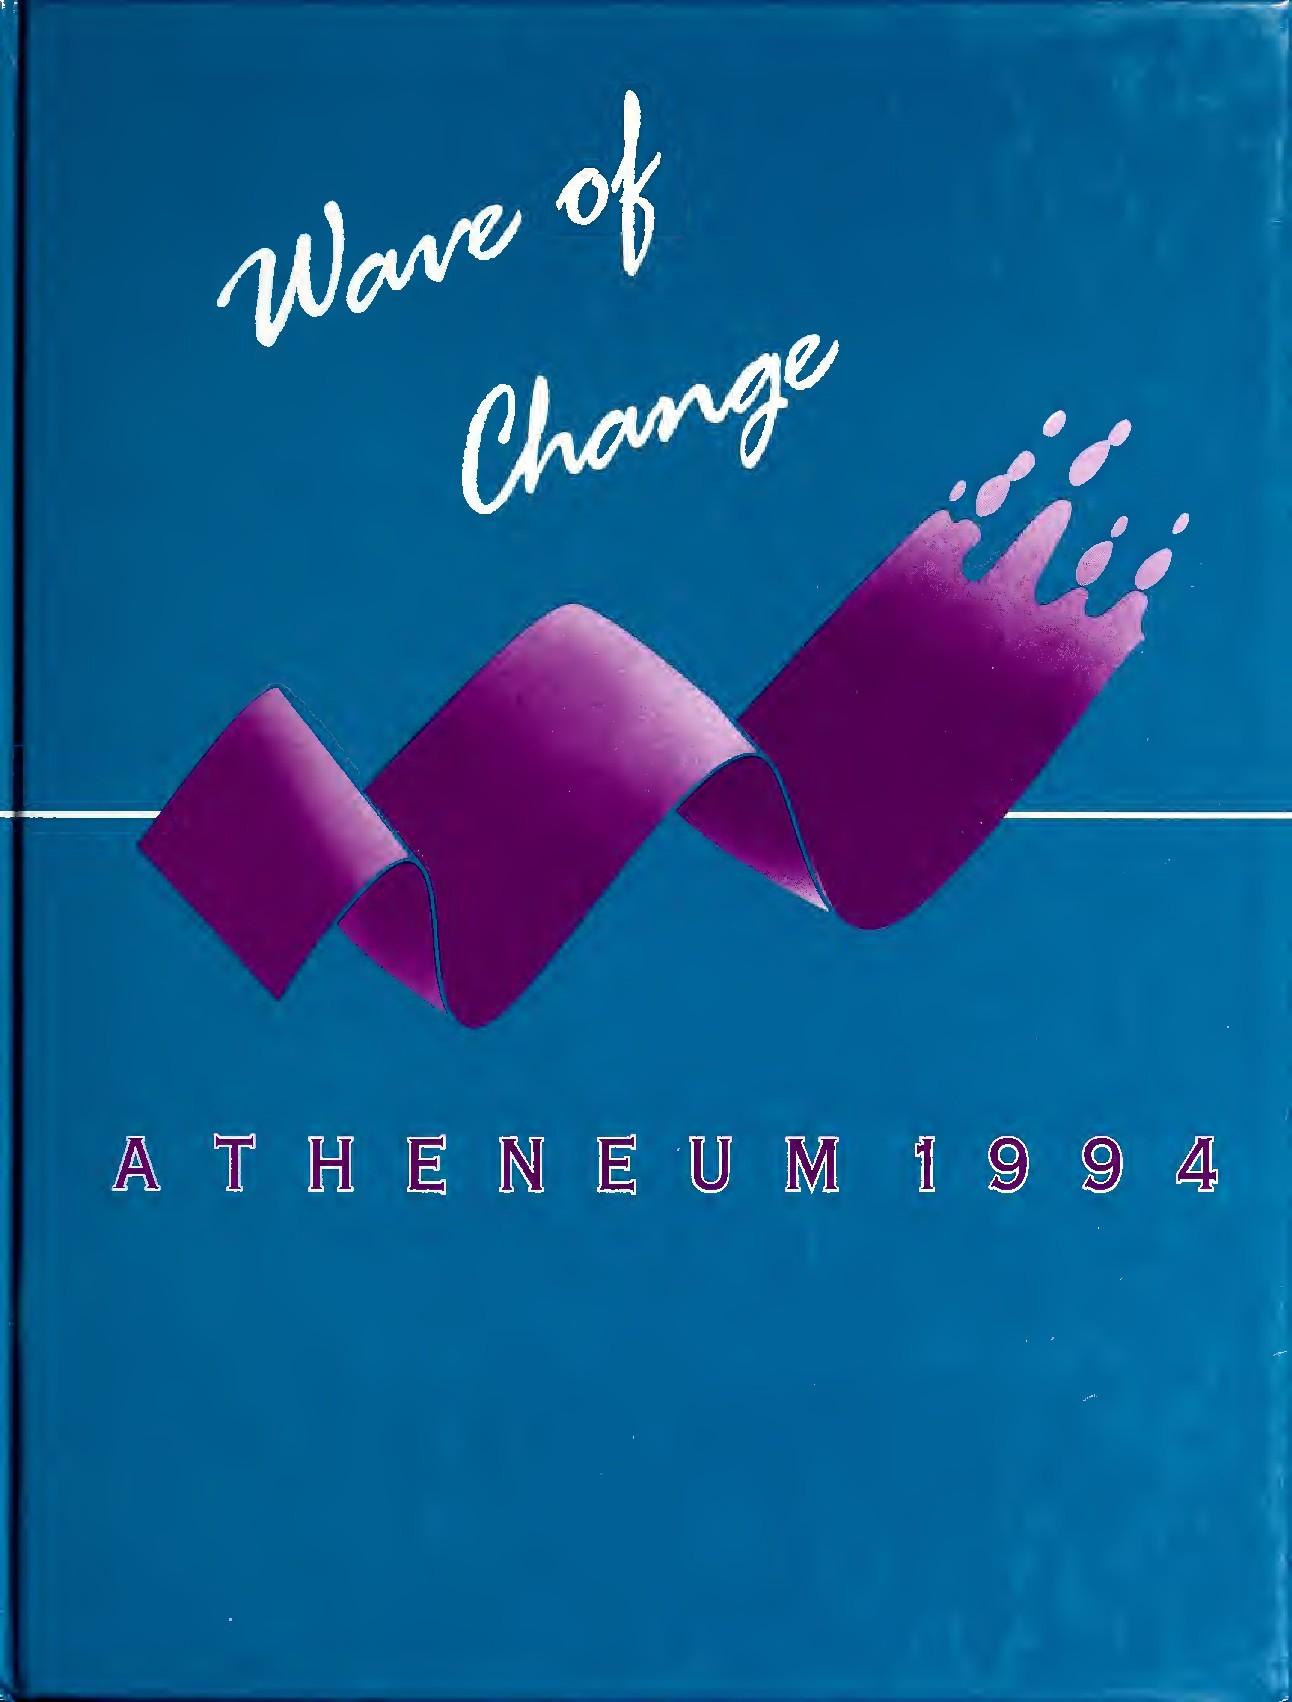 Atheneum, 1994